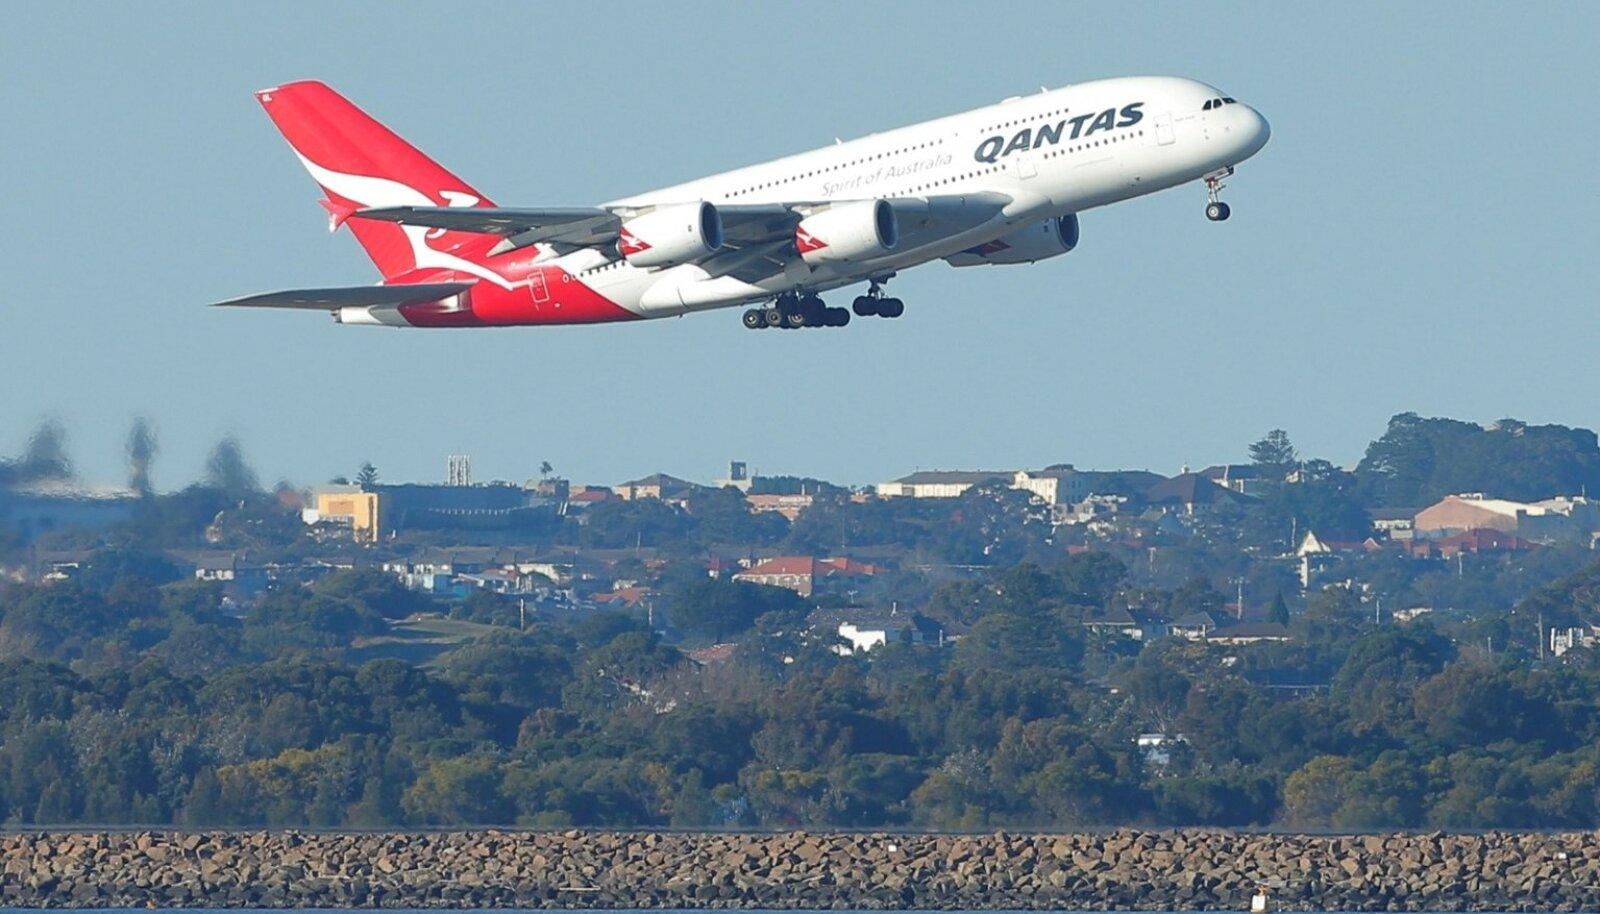 Lennufirma Qantas lennuk. Foto on illustratiivne.